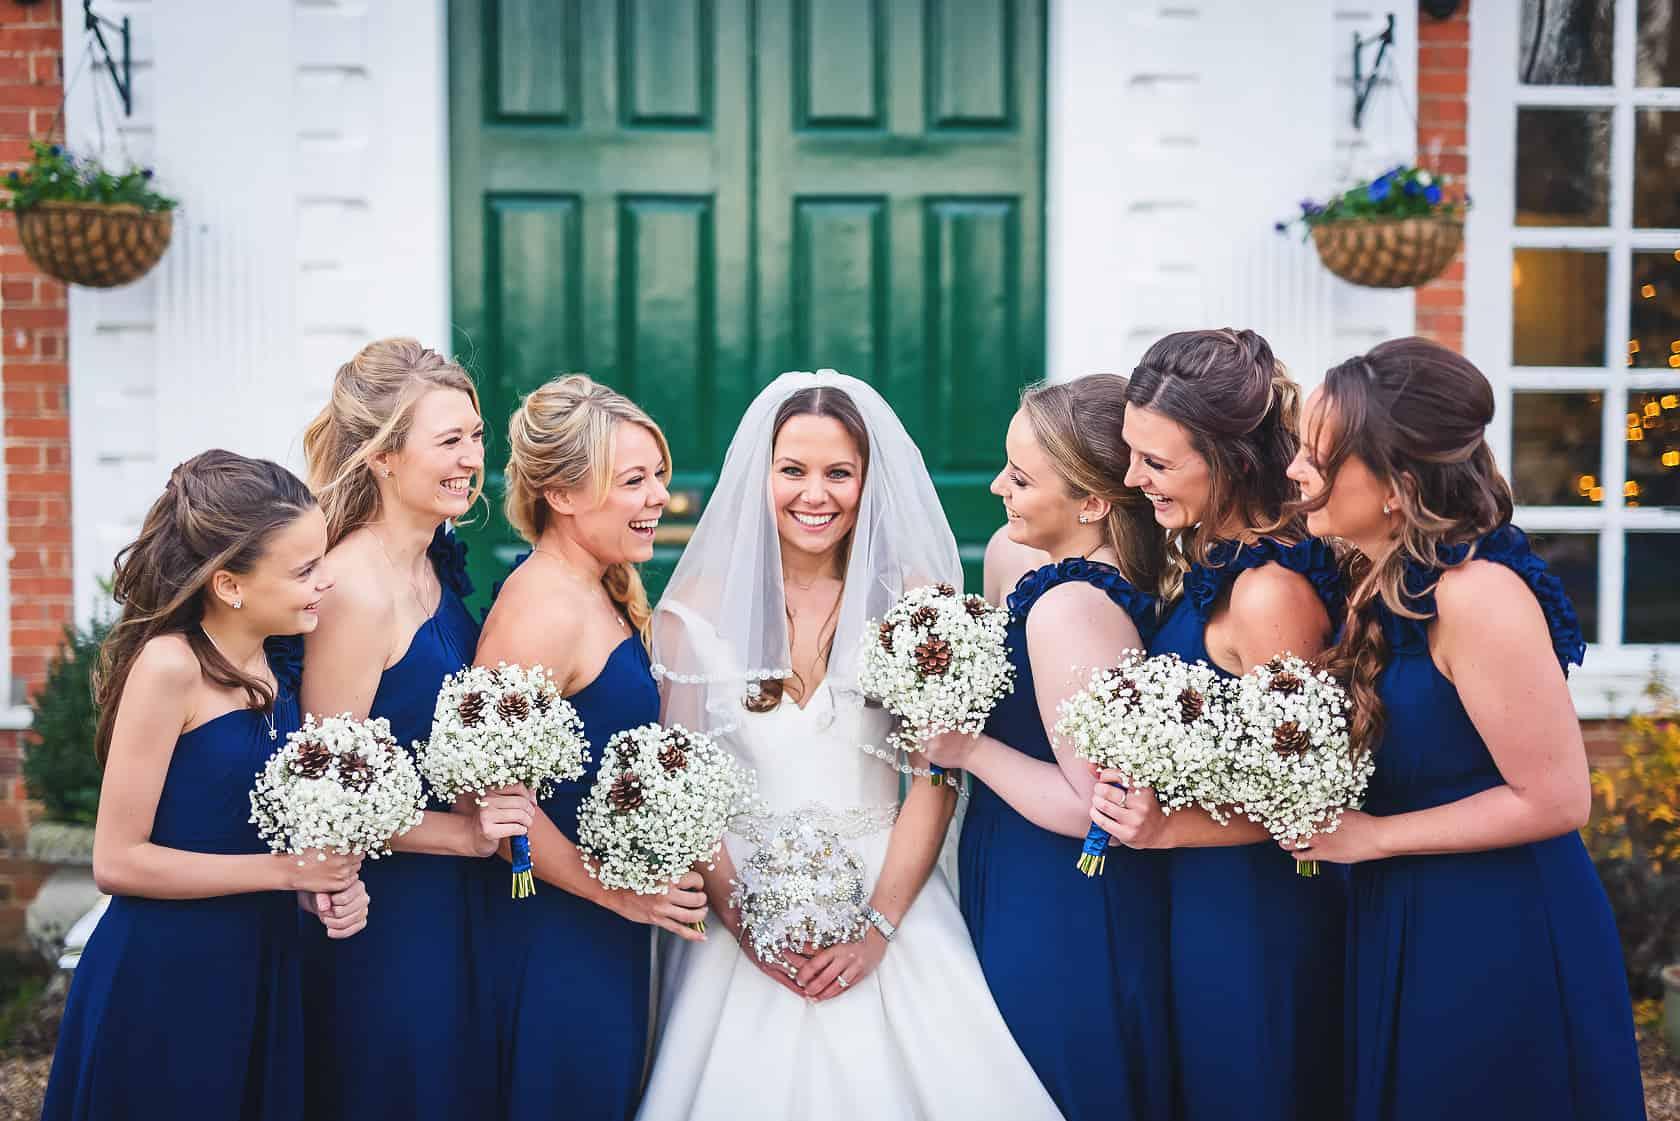 Best_Wedding_Photography_2018_Wedding-Photographer-Essex-and-London_028